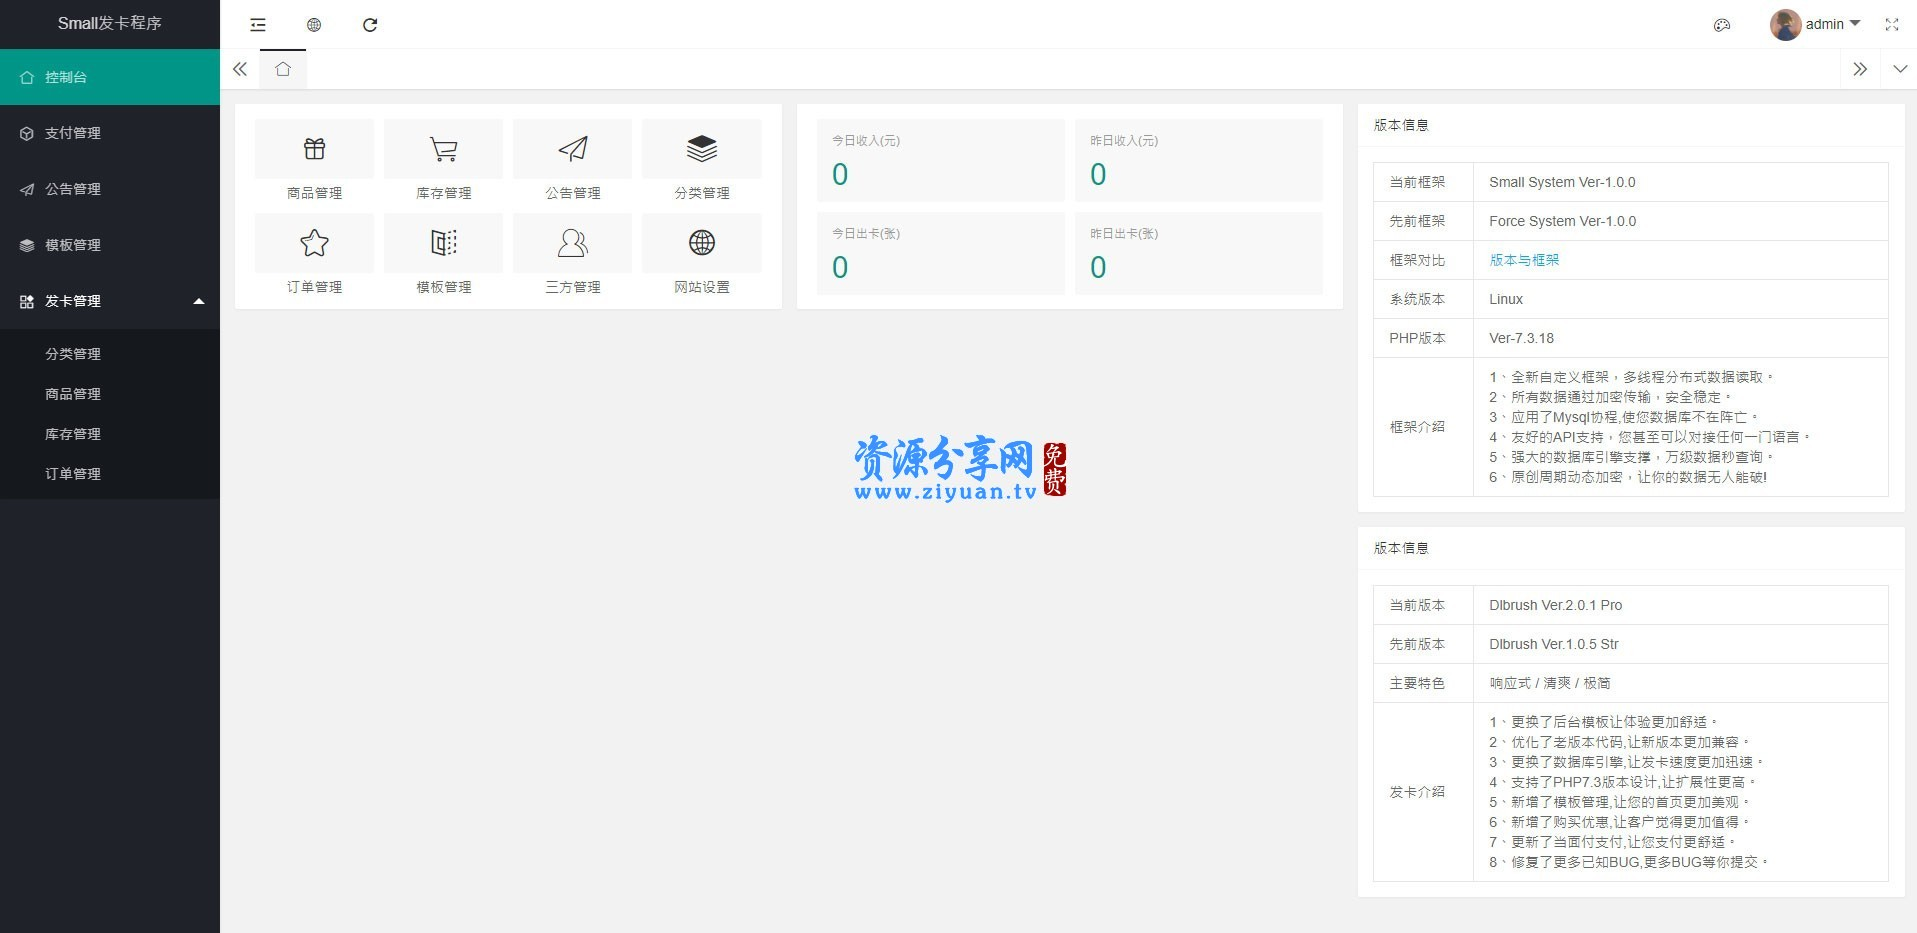 small 发卡源码 V1.0.1 最新版 small 发卡网源码+支付系统+内置对接系统